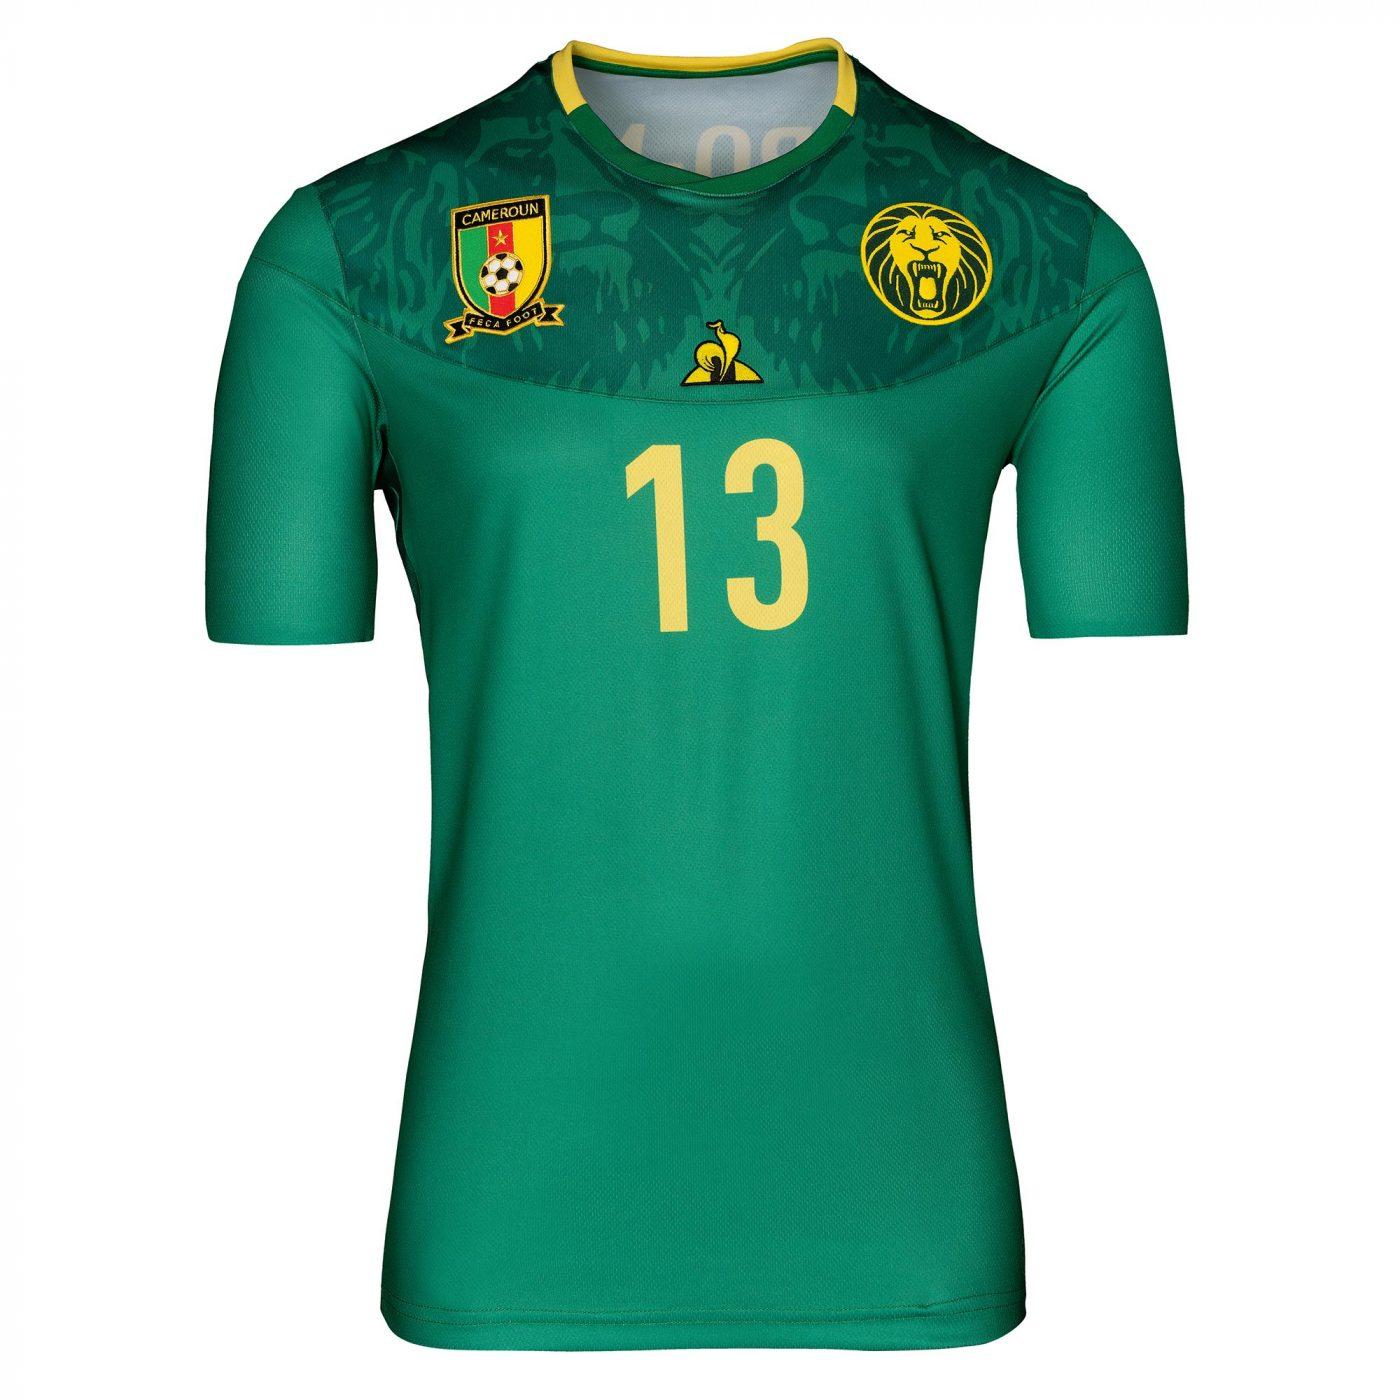 maillot-domicile-cameroun-can-2019-coupe-du-monde-feminine-2019-le-coq-sportif-2